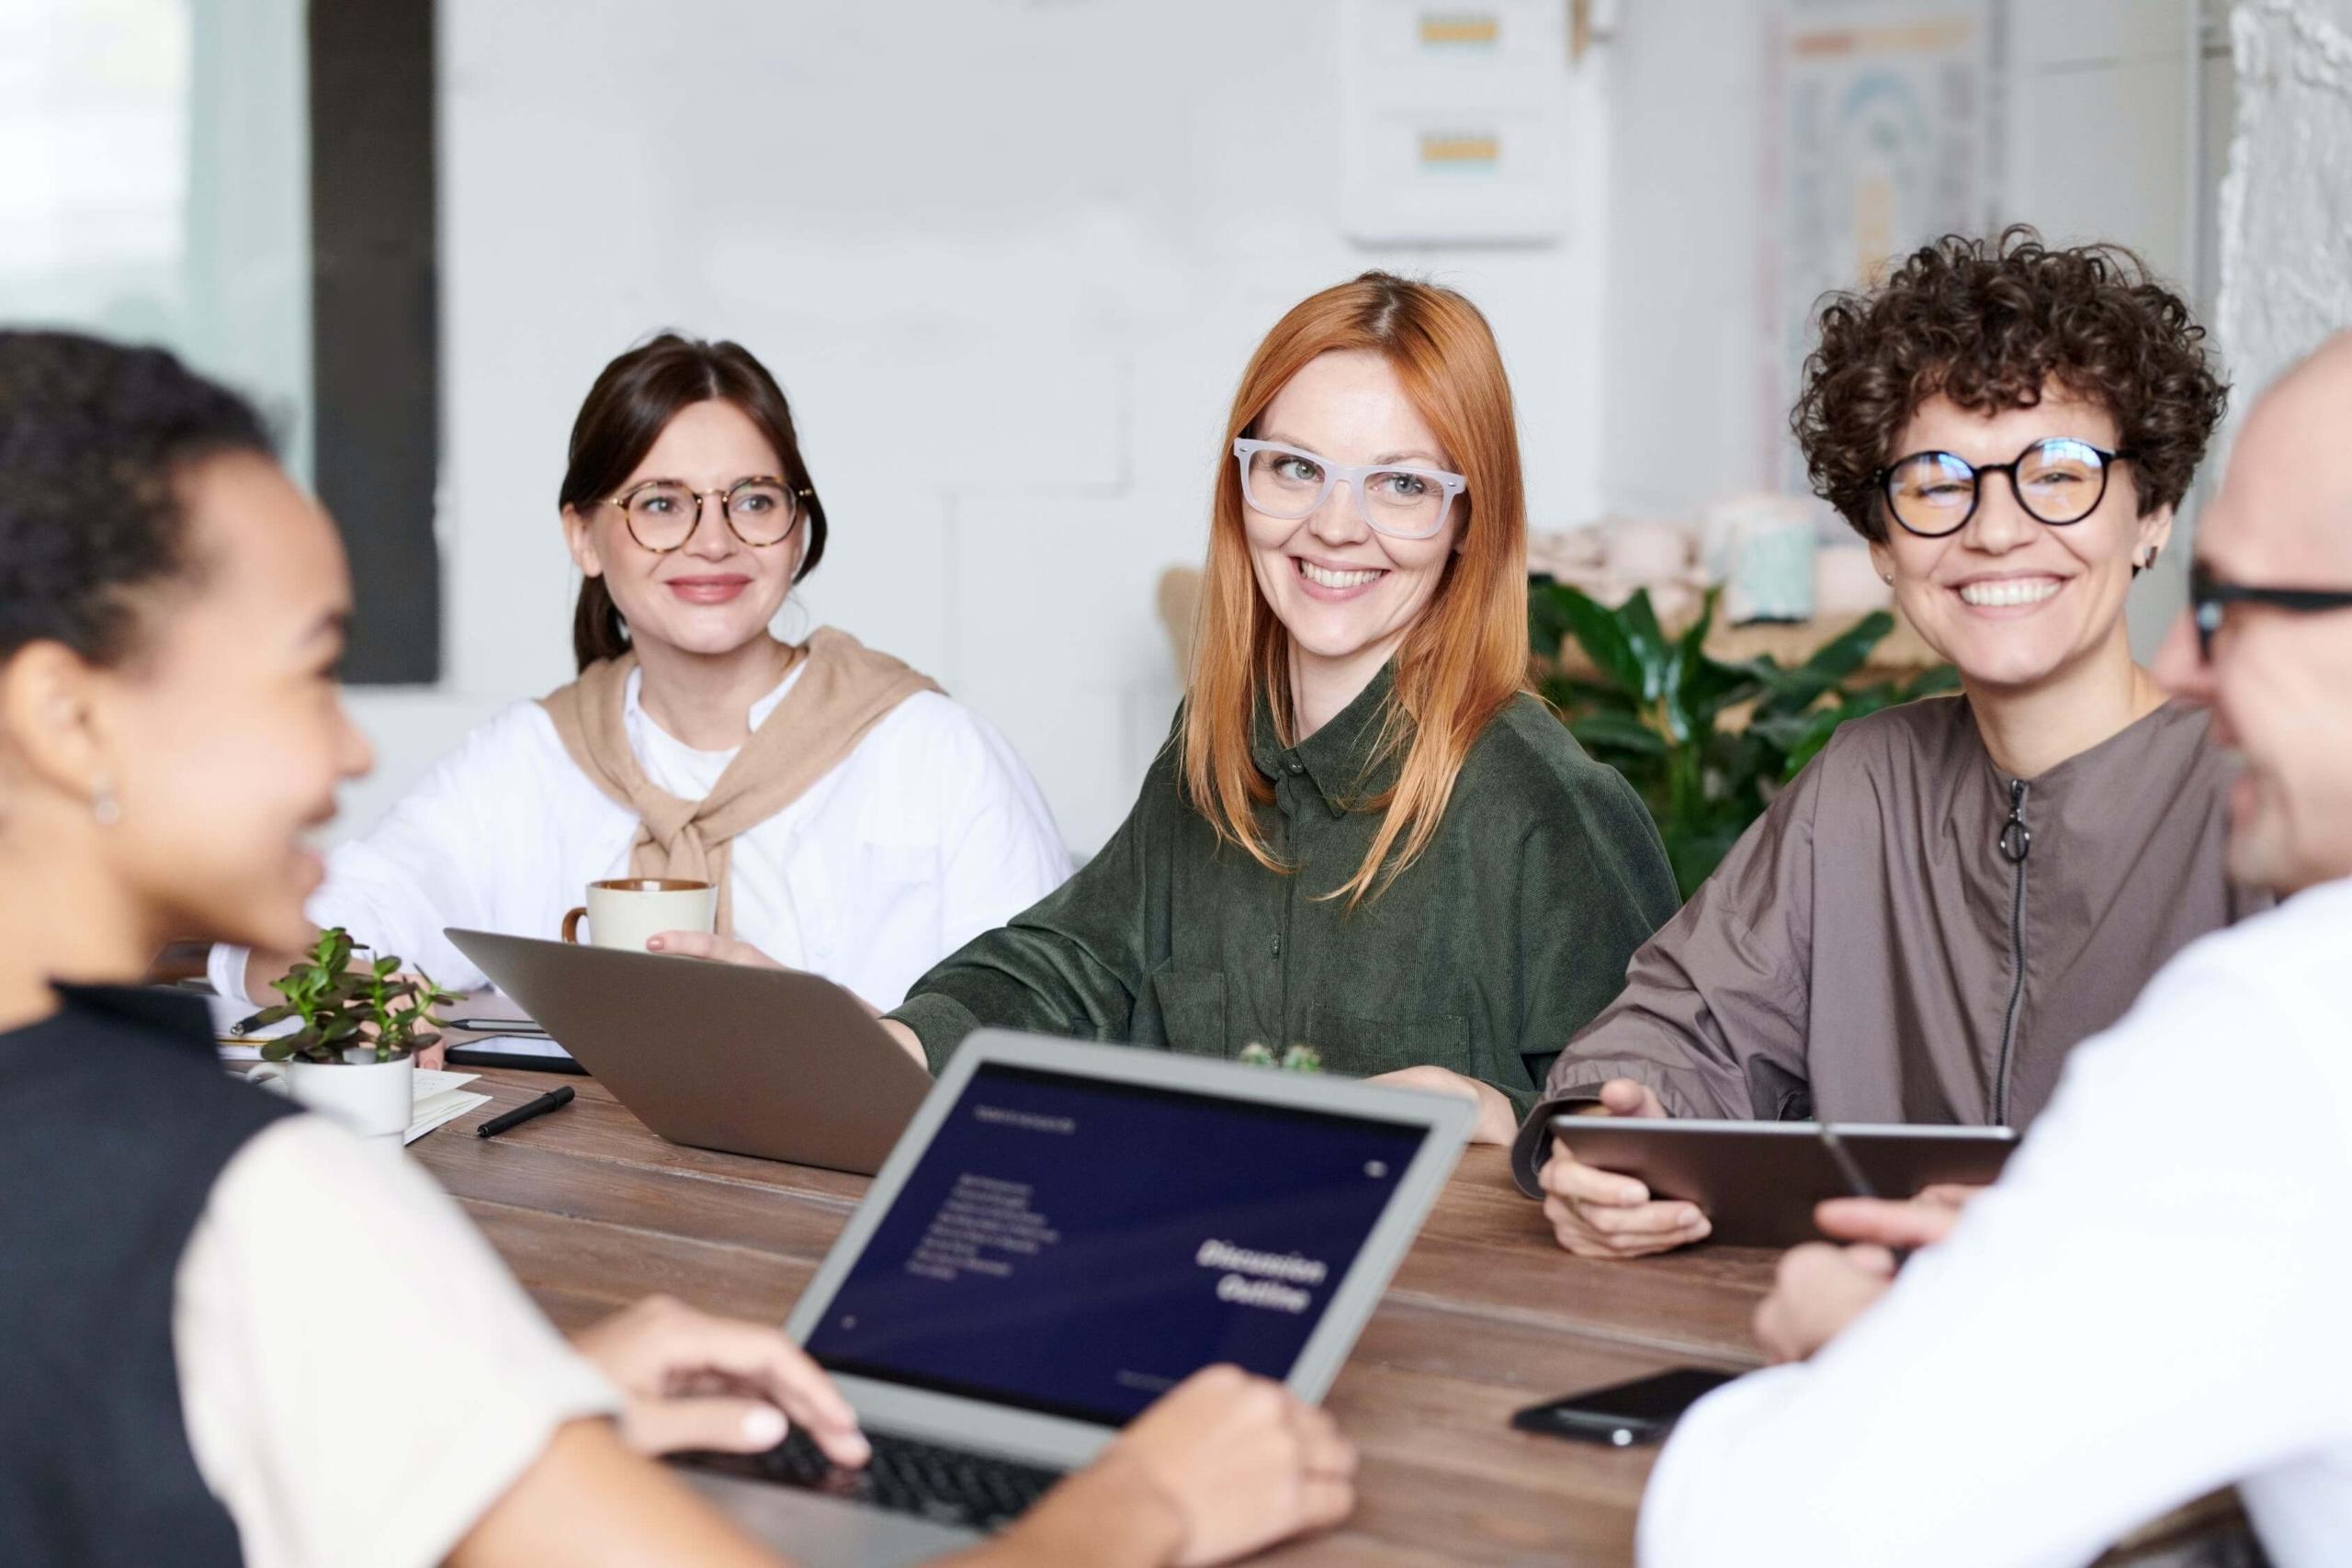 Email Marketing, B2B Marketing, Lead Magnets